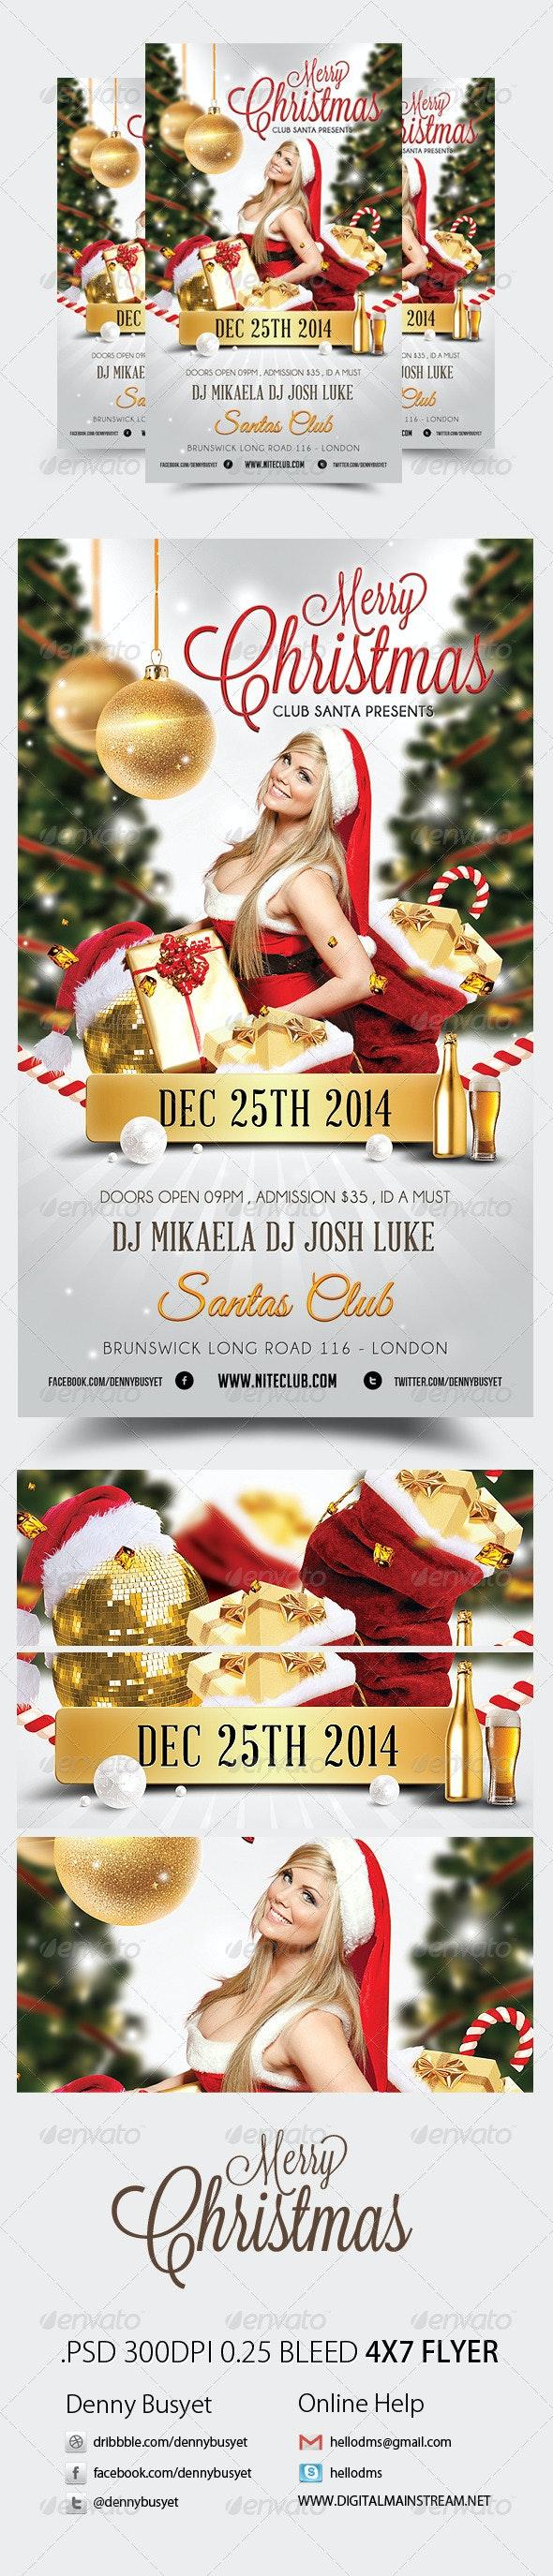 Merry Christmas Nightclub Psd Flyer Template - Holidays Events